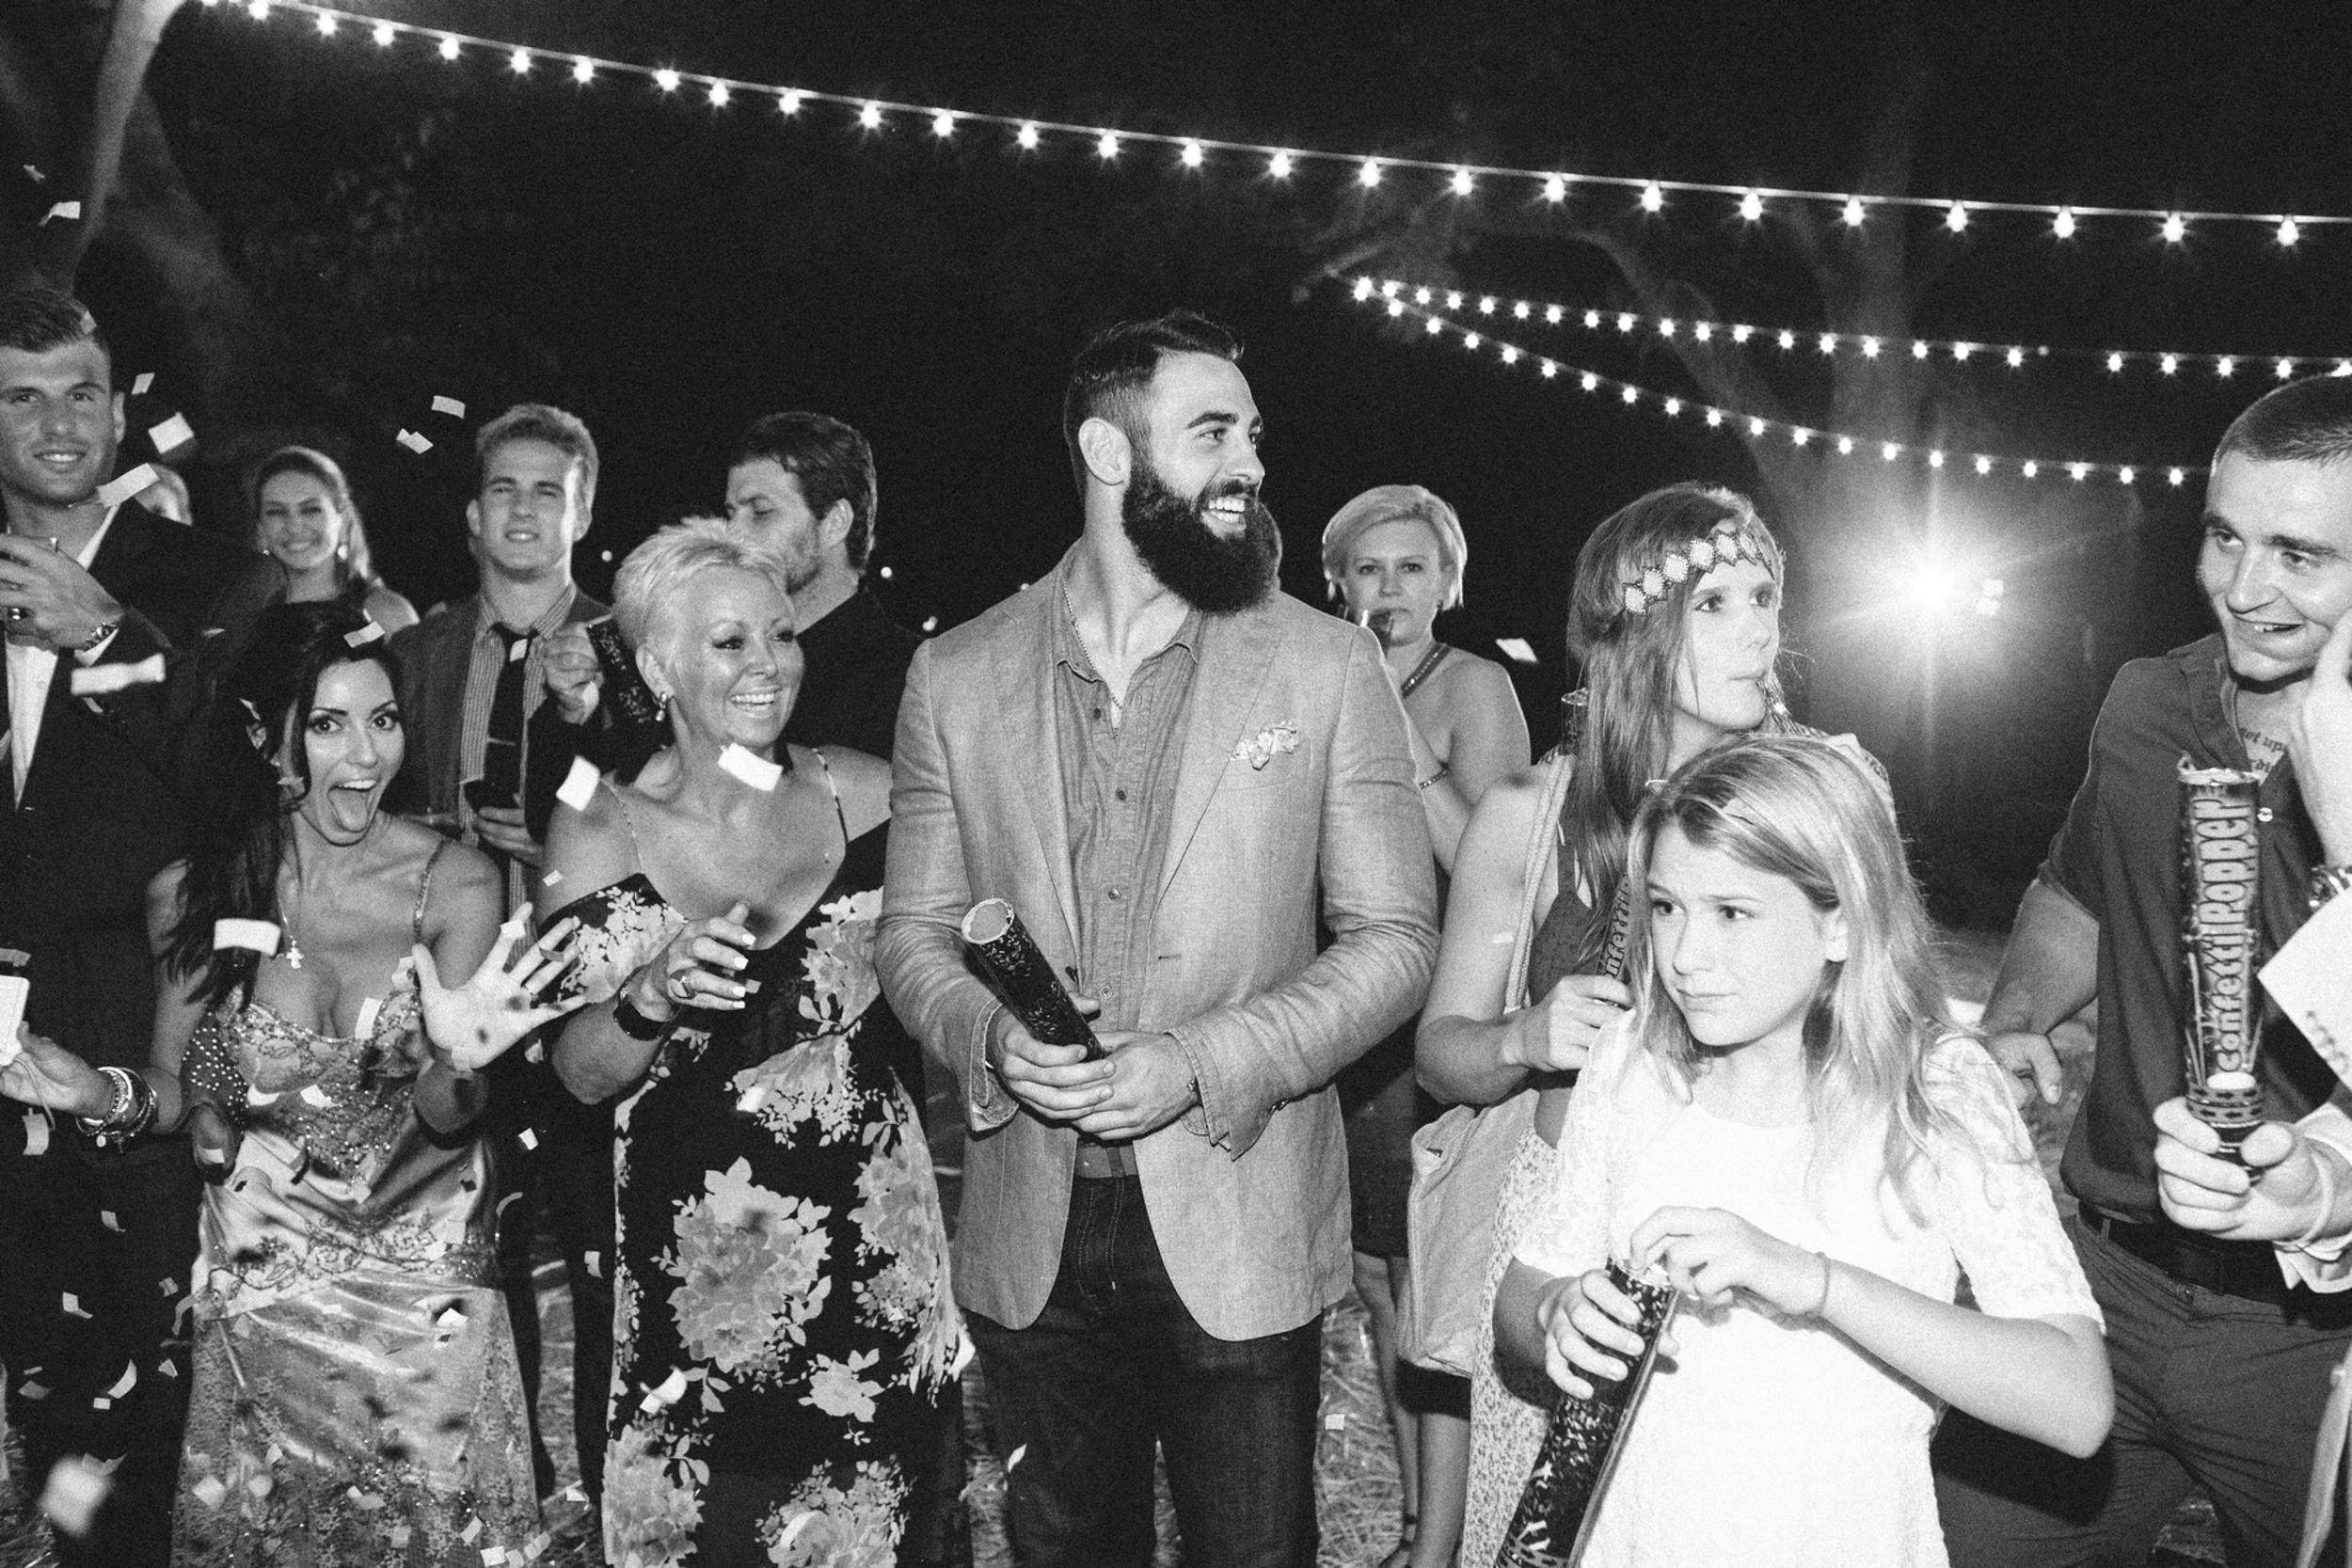 south_carolina_farm_wedding_rustic_chic_surprise_secret_luxe_wedding_bachelorette_emily_maynard_real_weddings-45.jpg